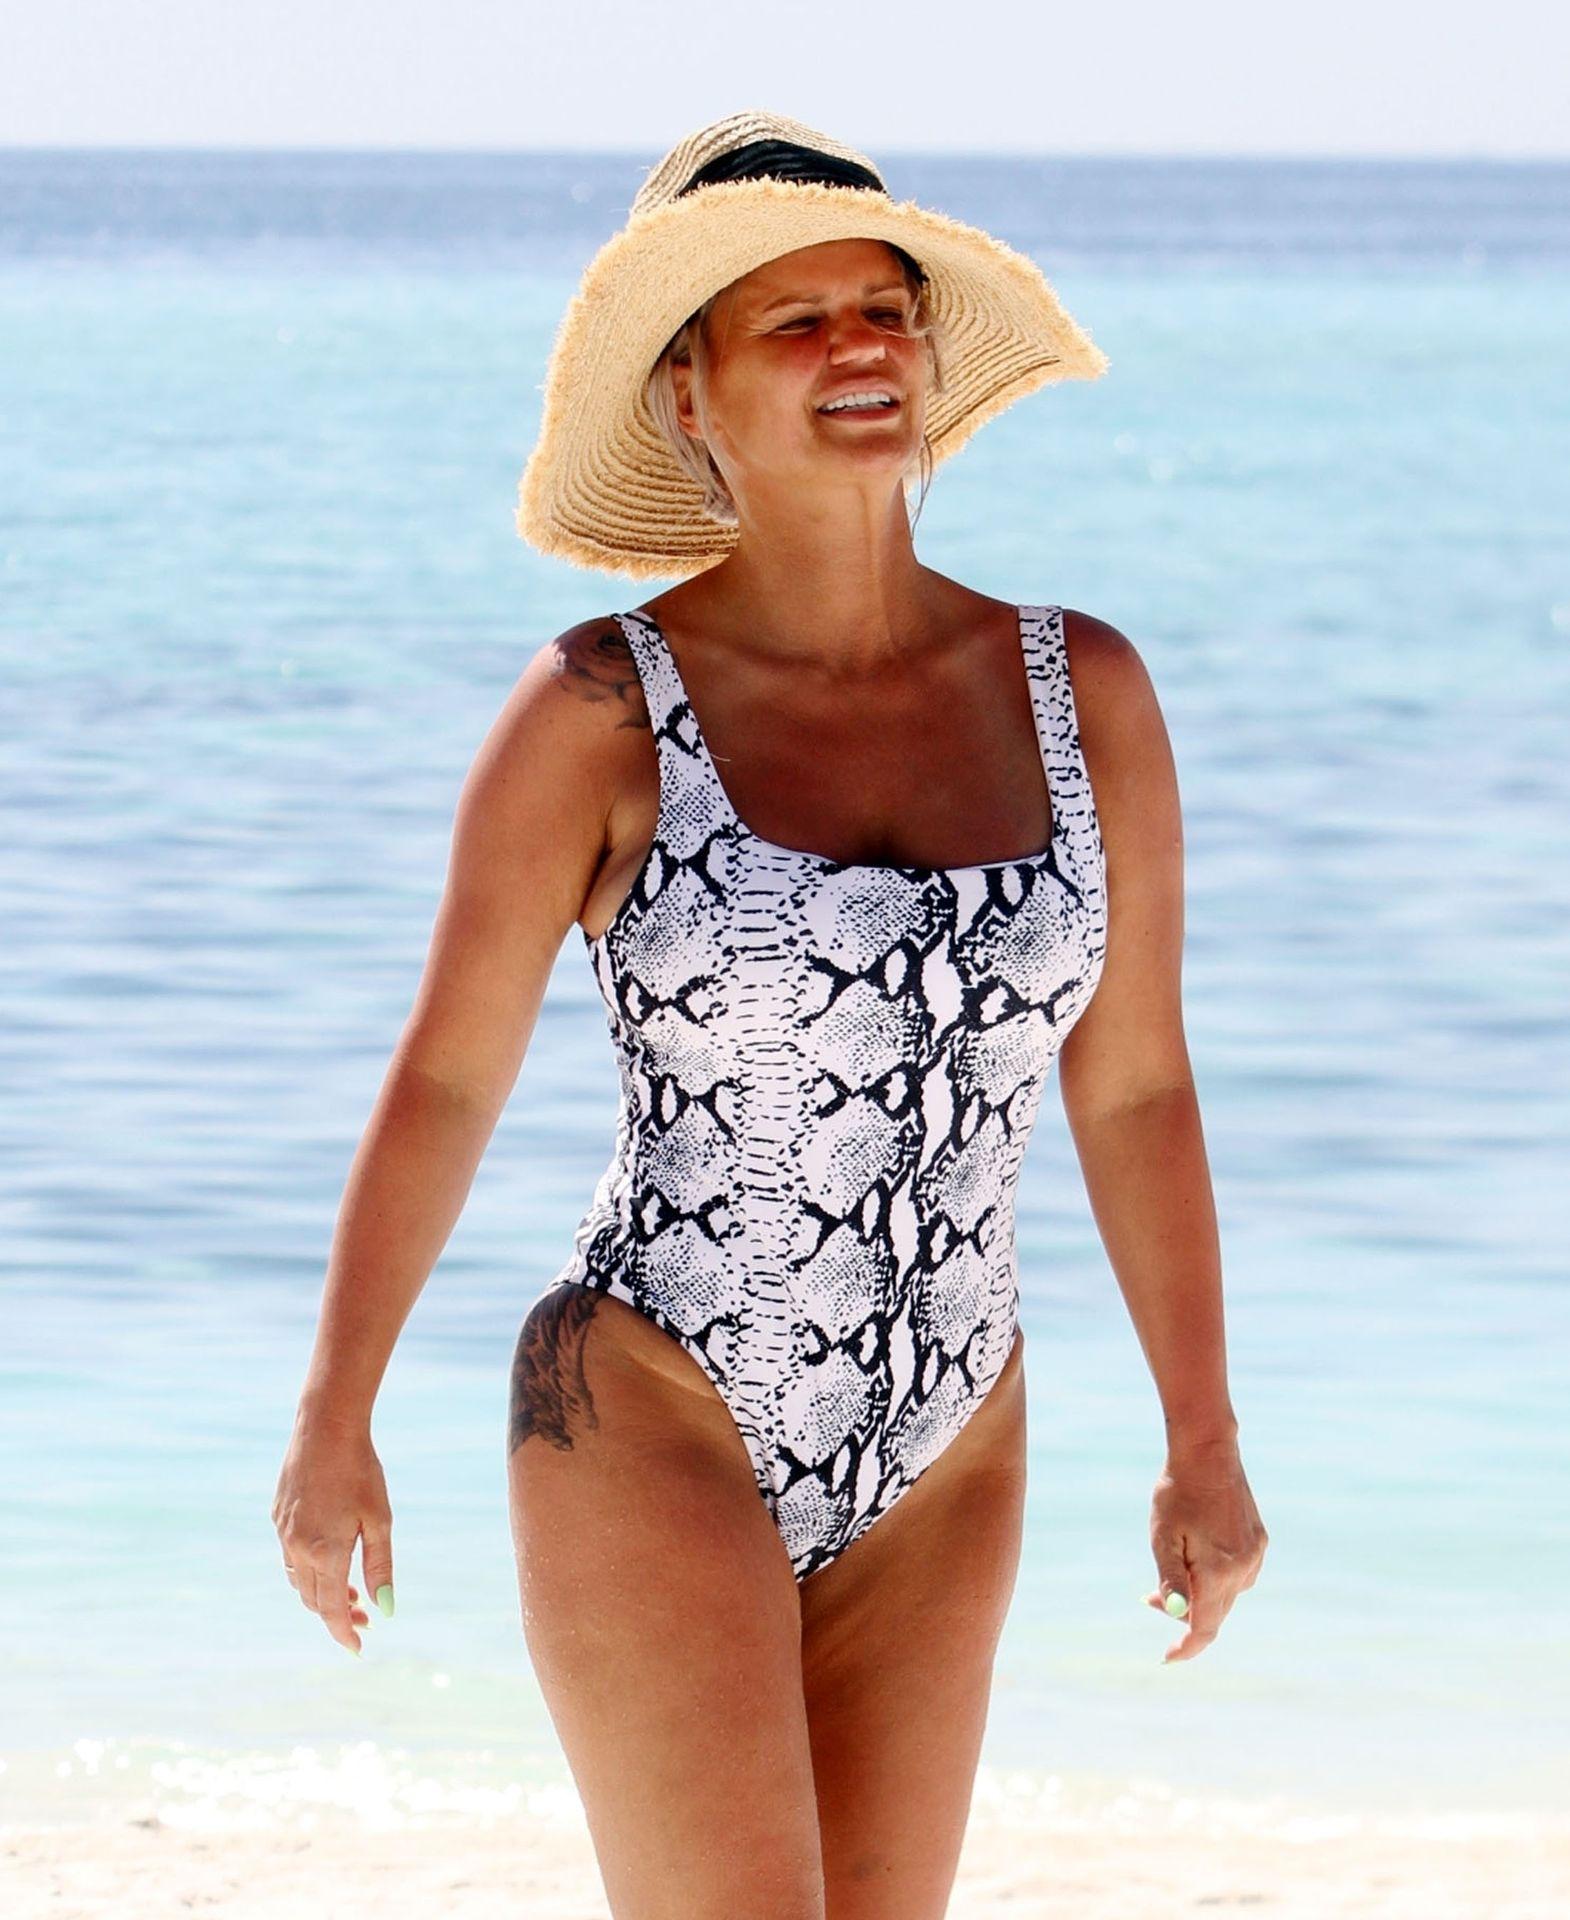 Kerry Katona & Ryan Mahoney Hit The Beach On Holiday At Their Luxury 5 Star Resort Ayada Maldives 0004